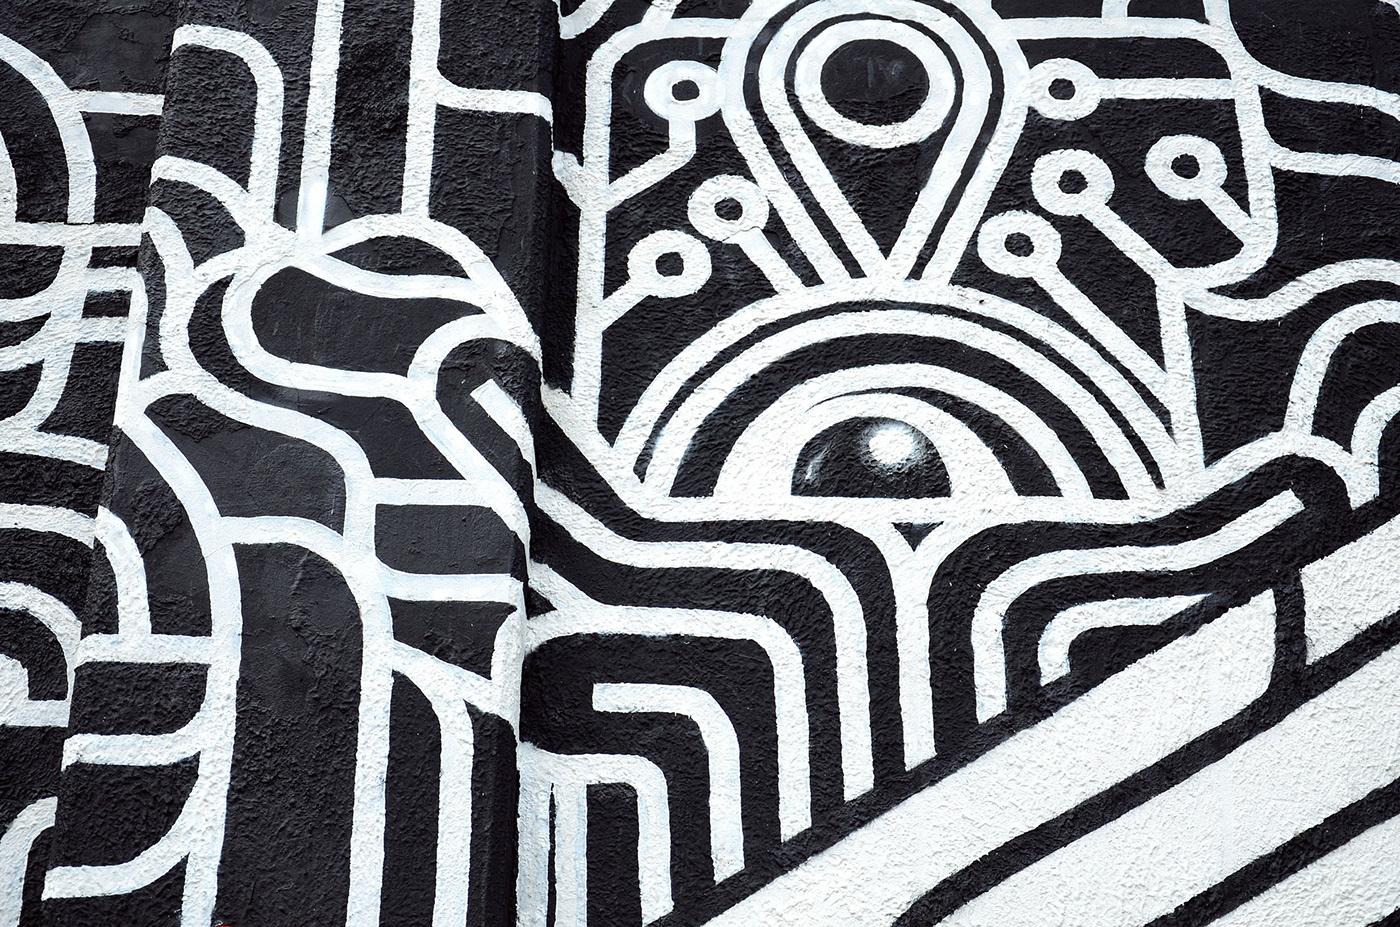 arturshirin ecomural ettoja lithuaniastreetart Mural Muralism streetart Urbanart vilniusstreetart wallart